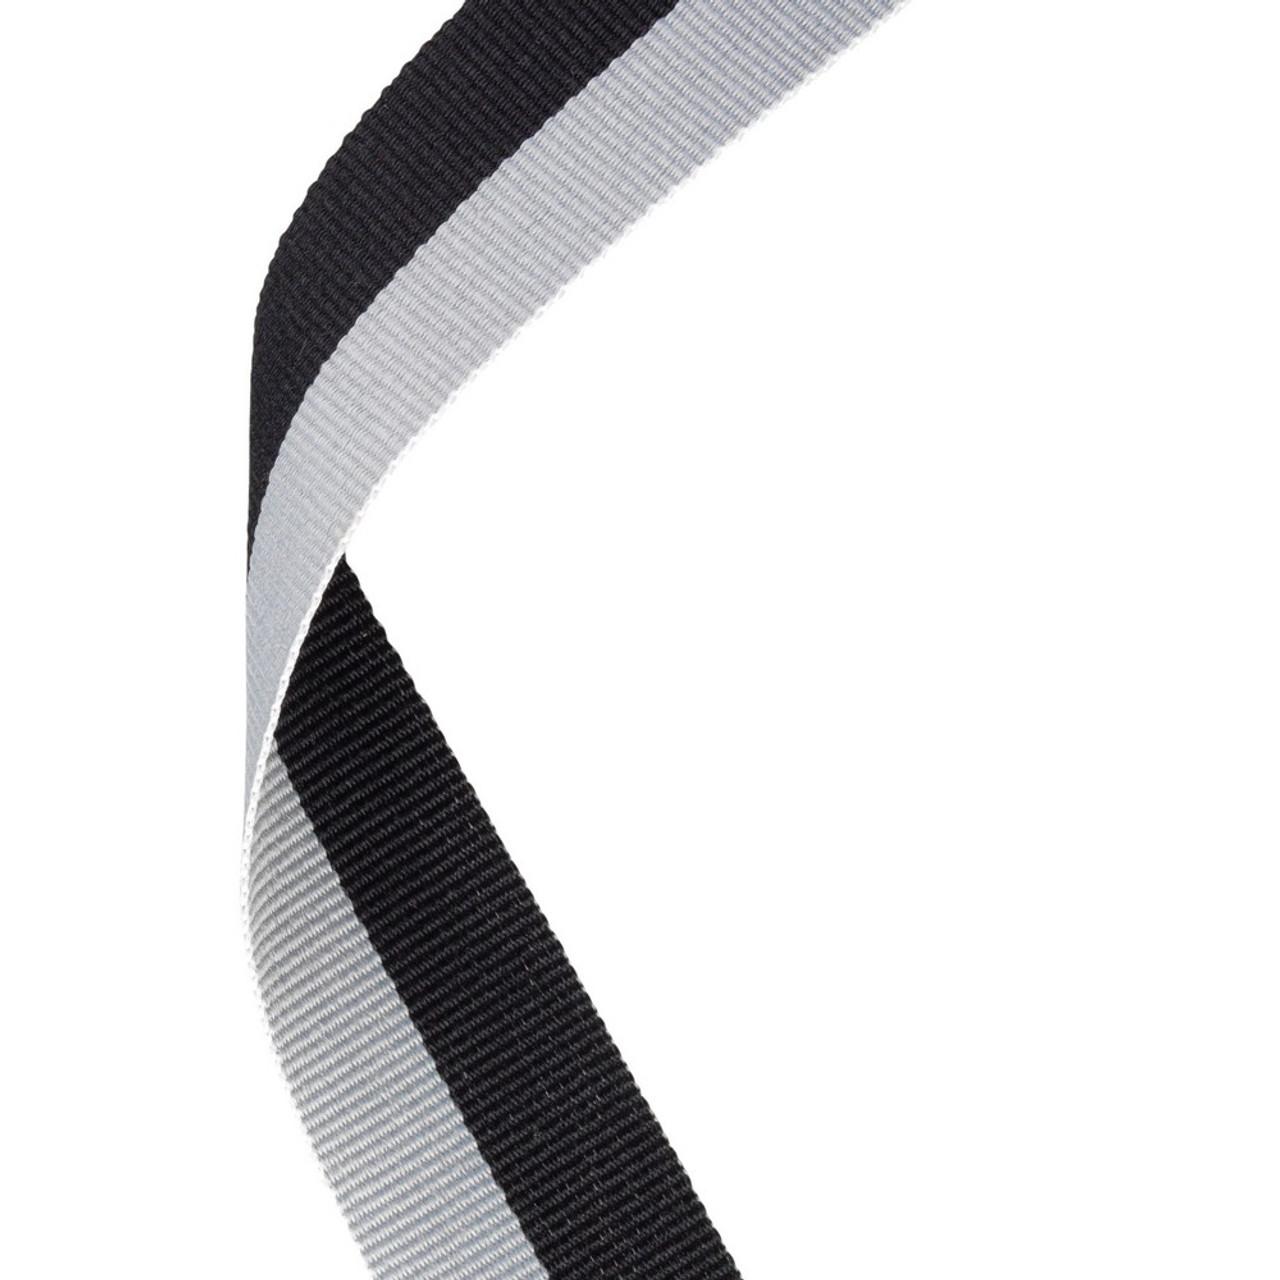 Black & Grey Medal Ribbon at 1stPlace4Trophies